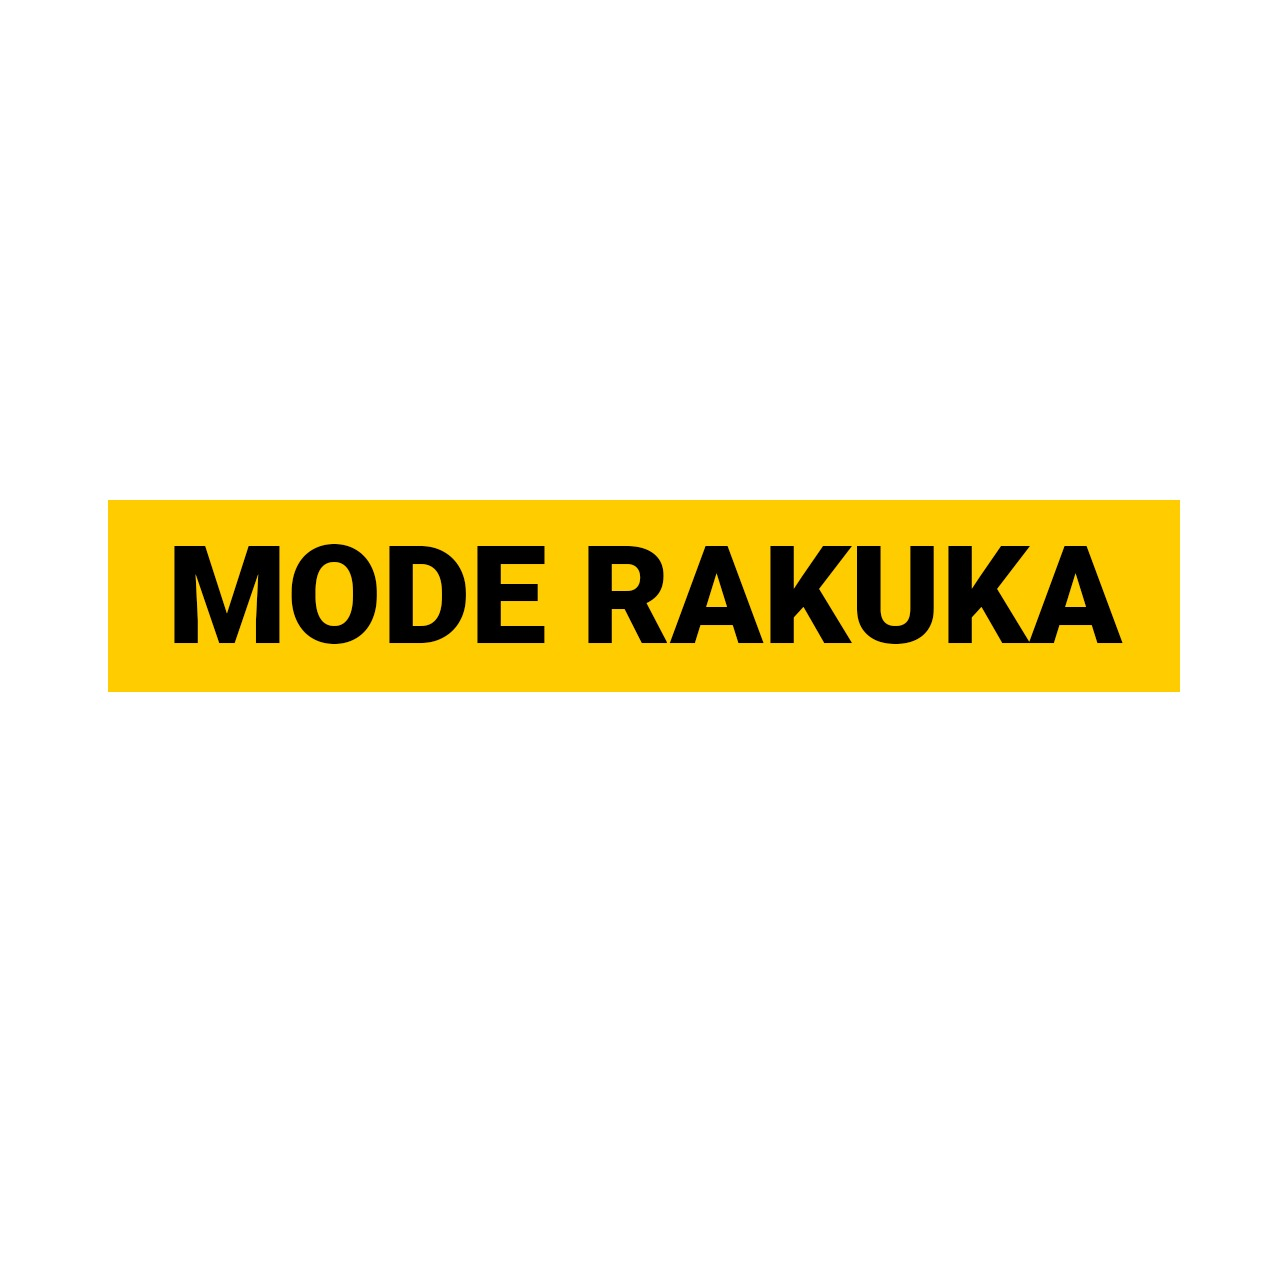 moderakuka